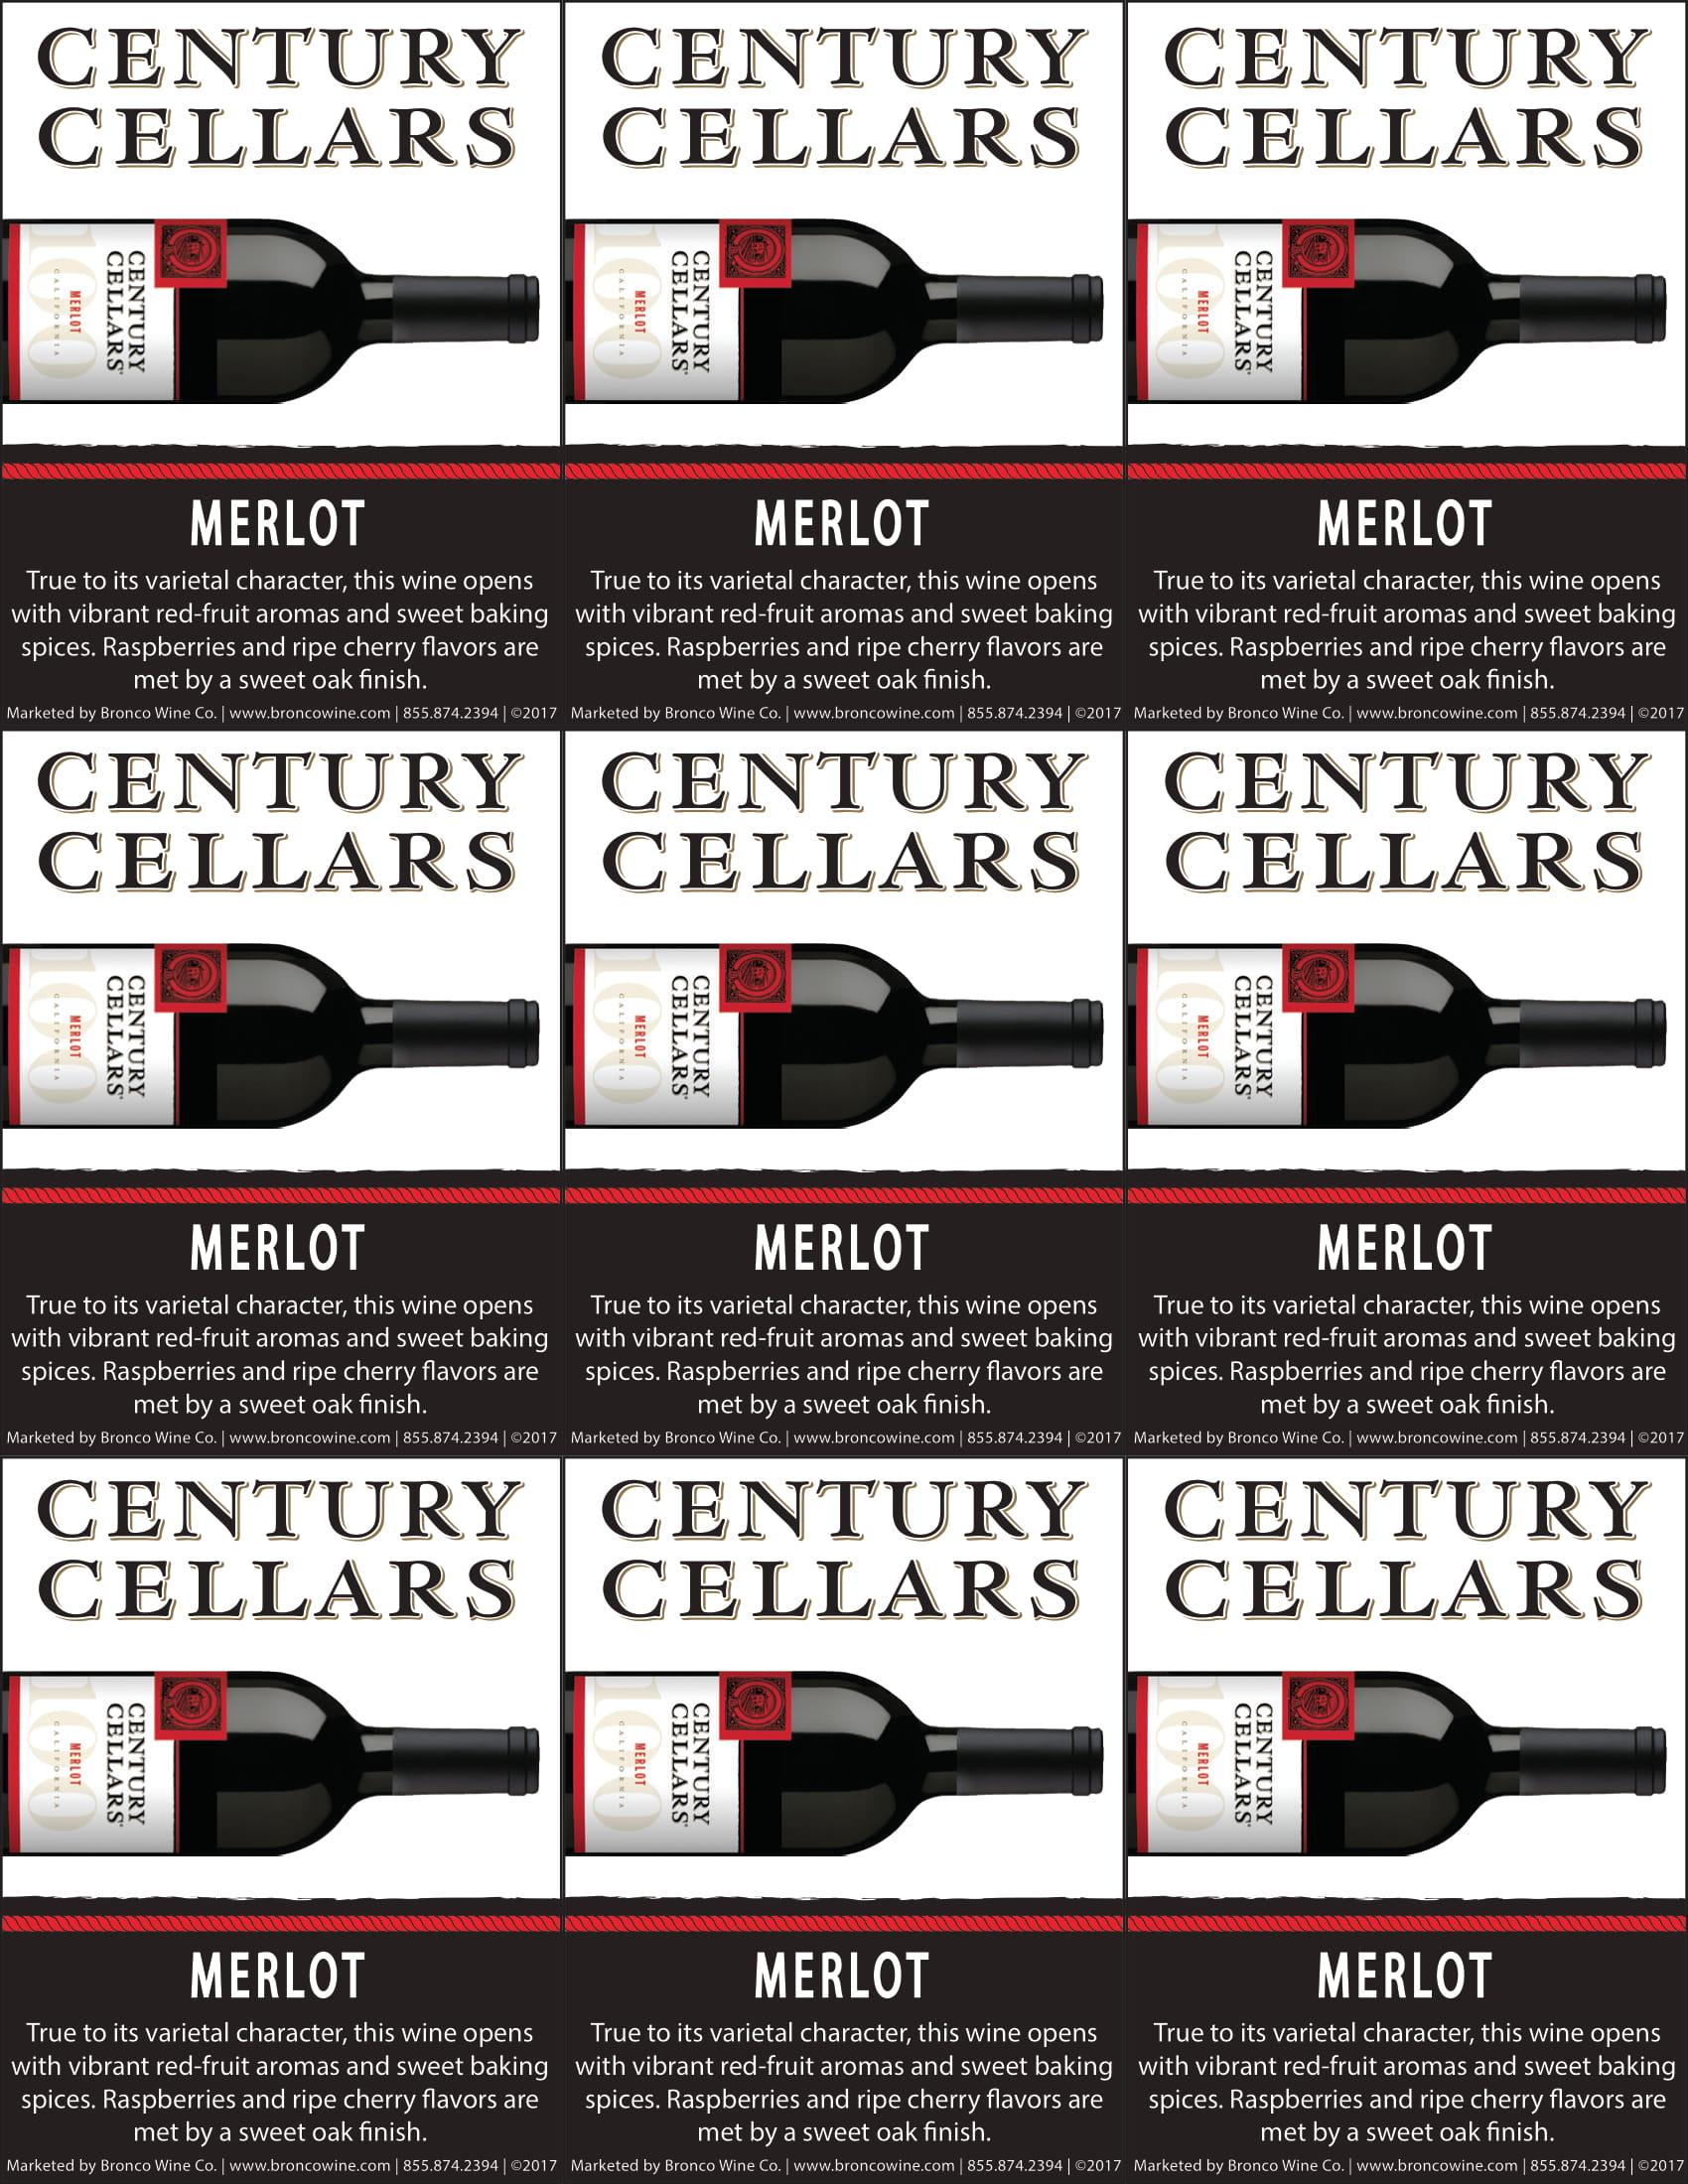 Century Cellars Merlot Shelf Talkers